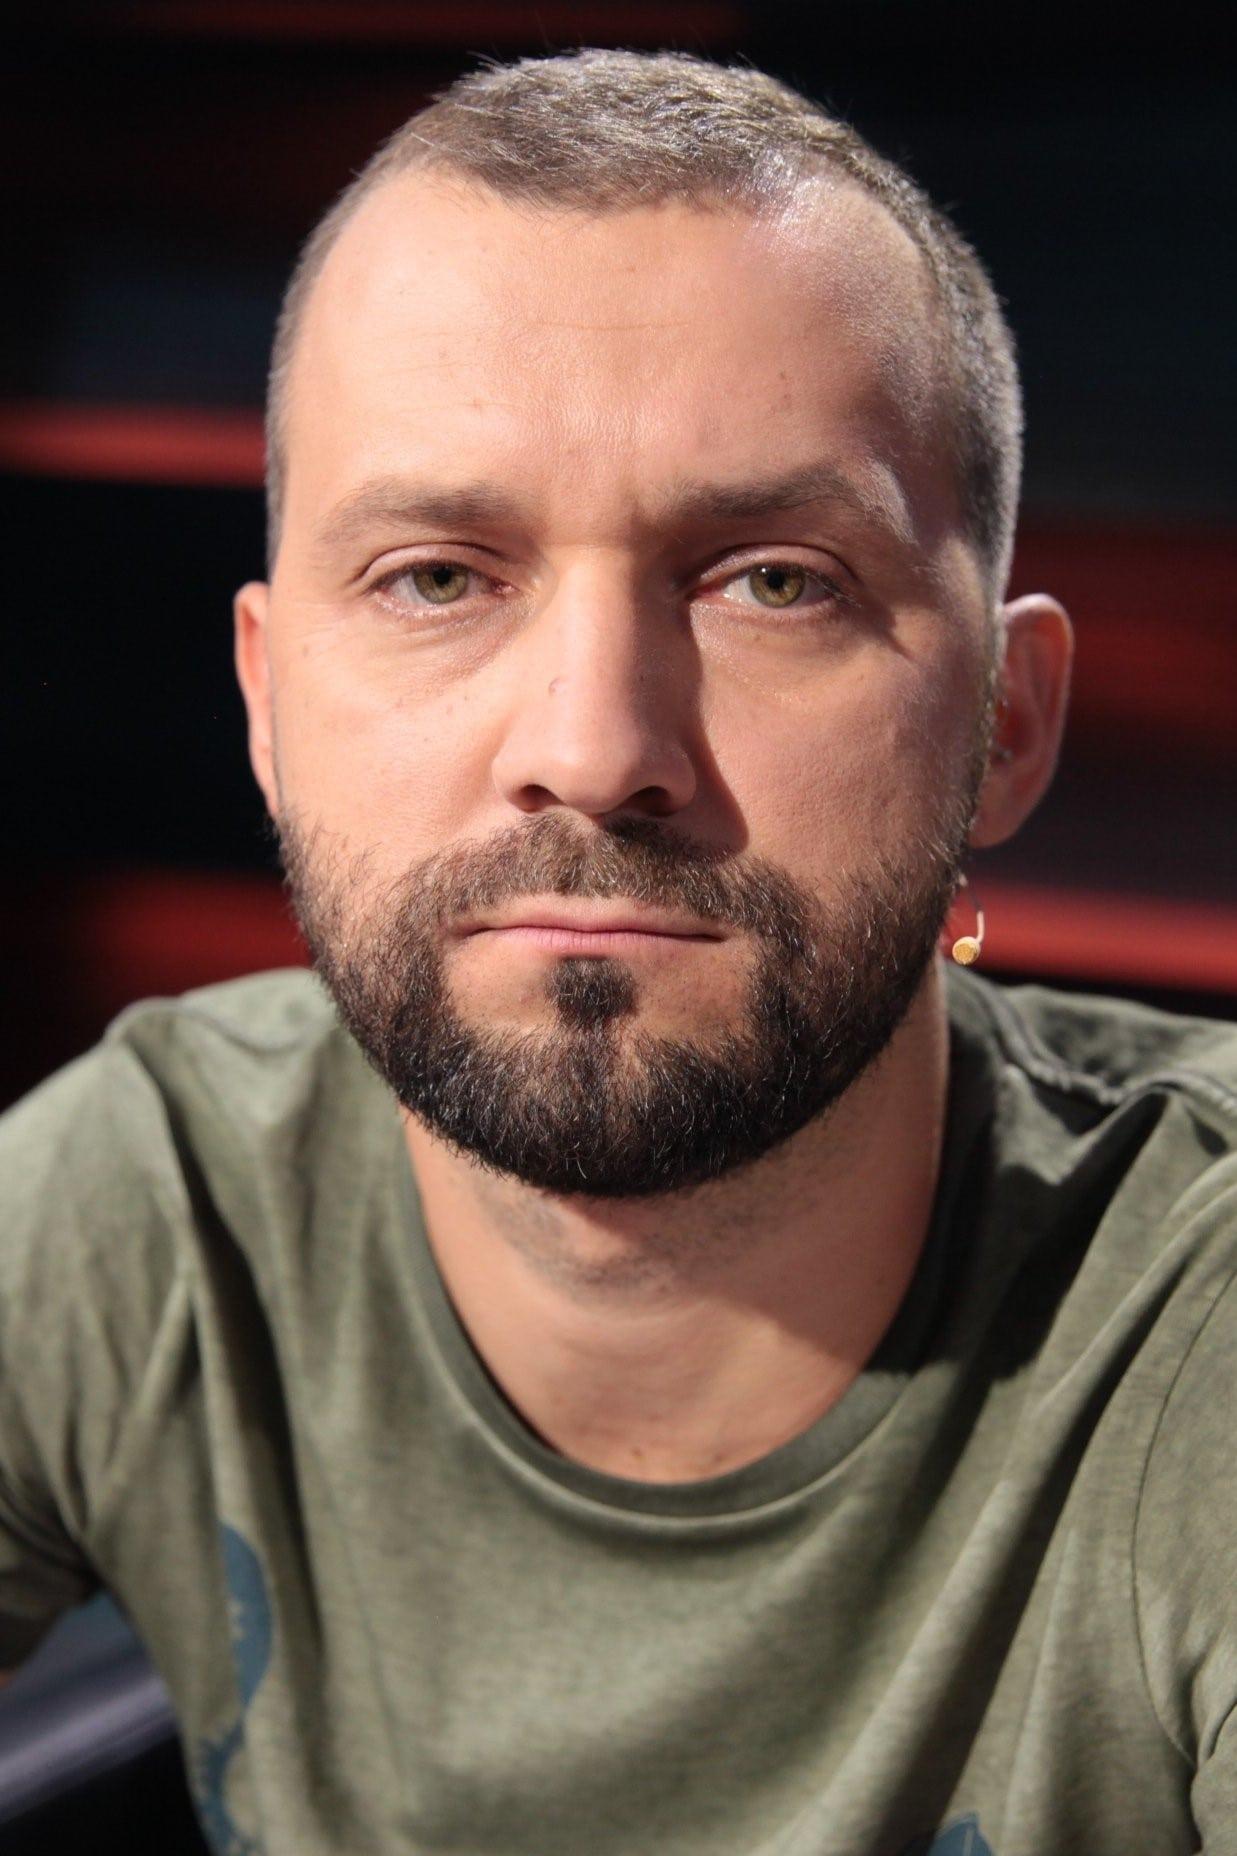 Ruslan Belyy